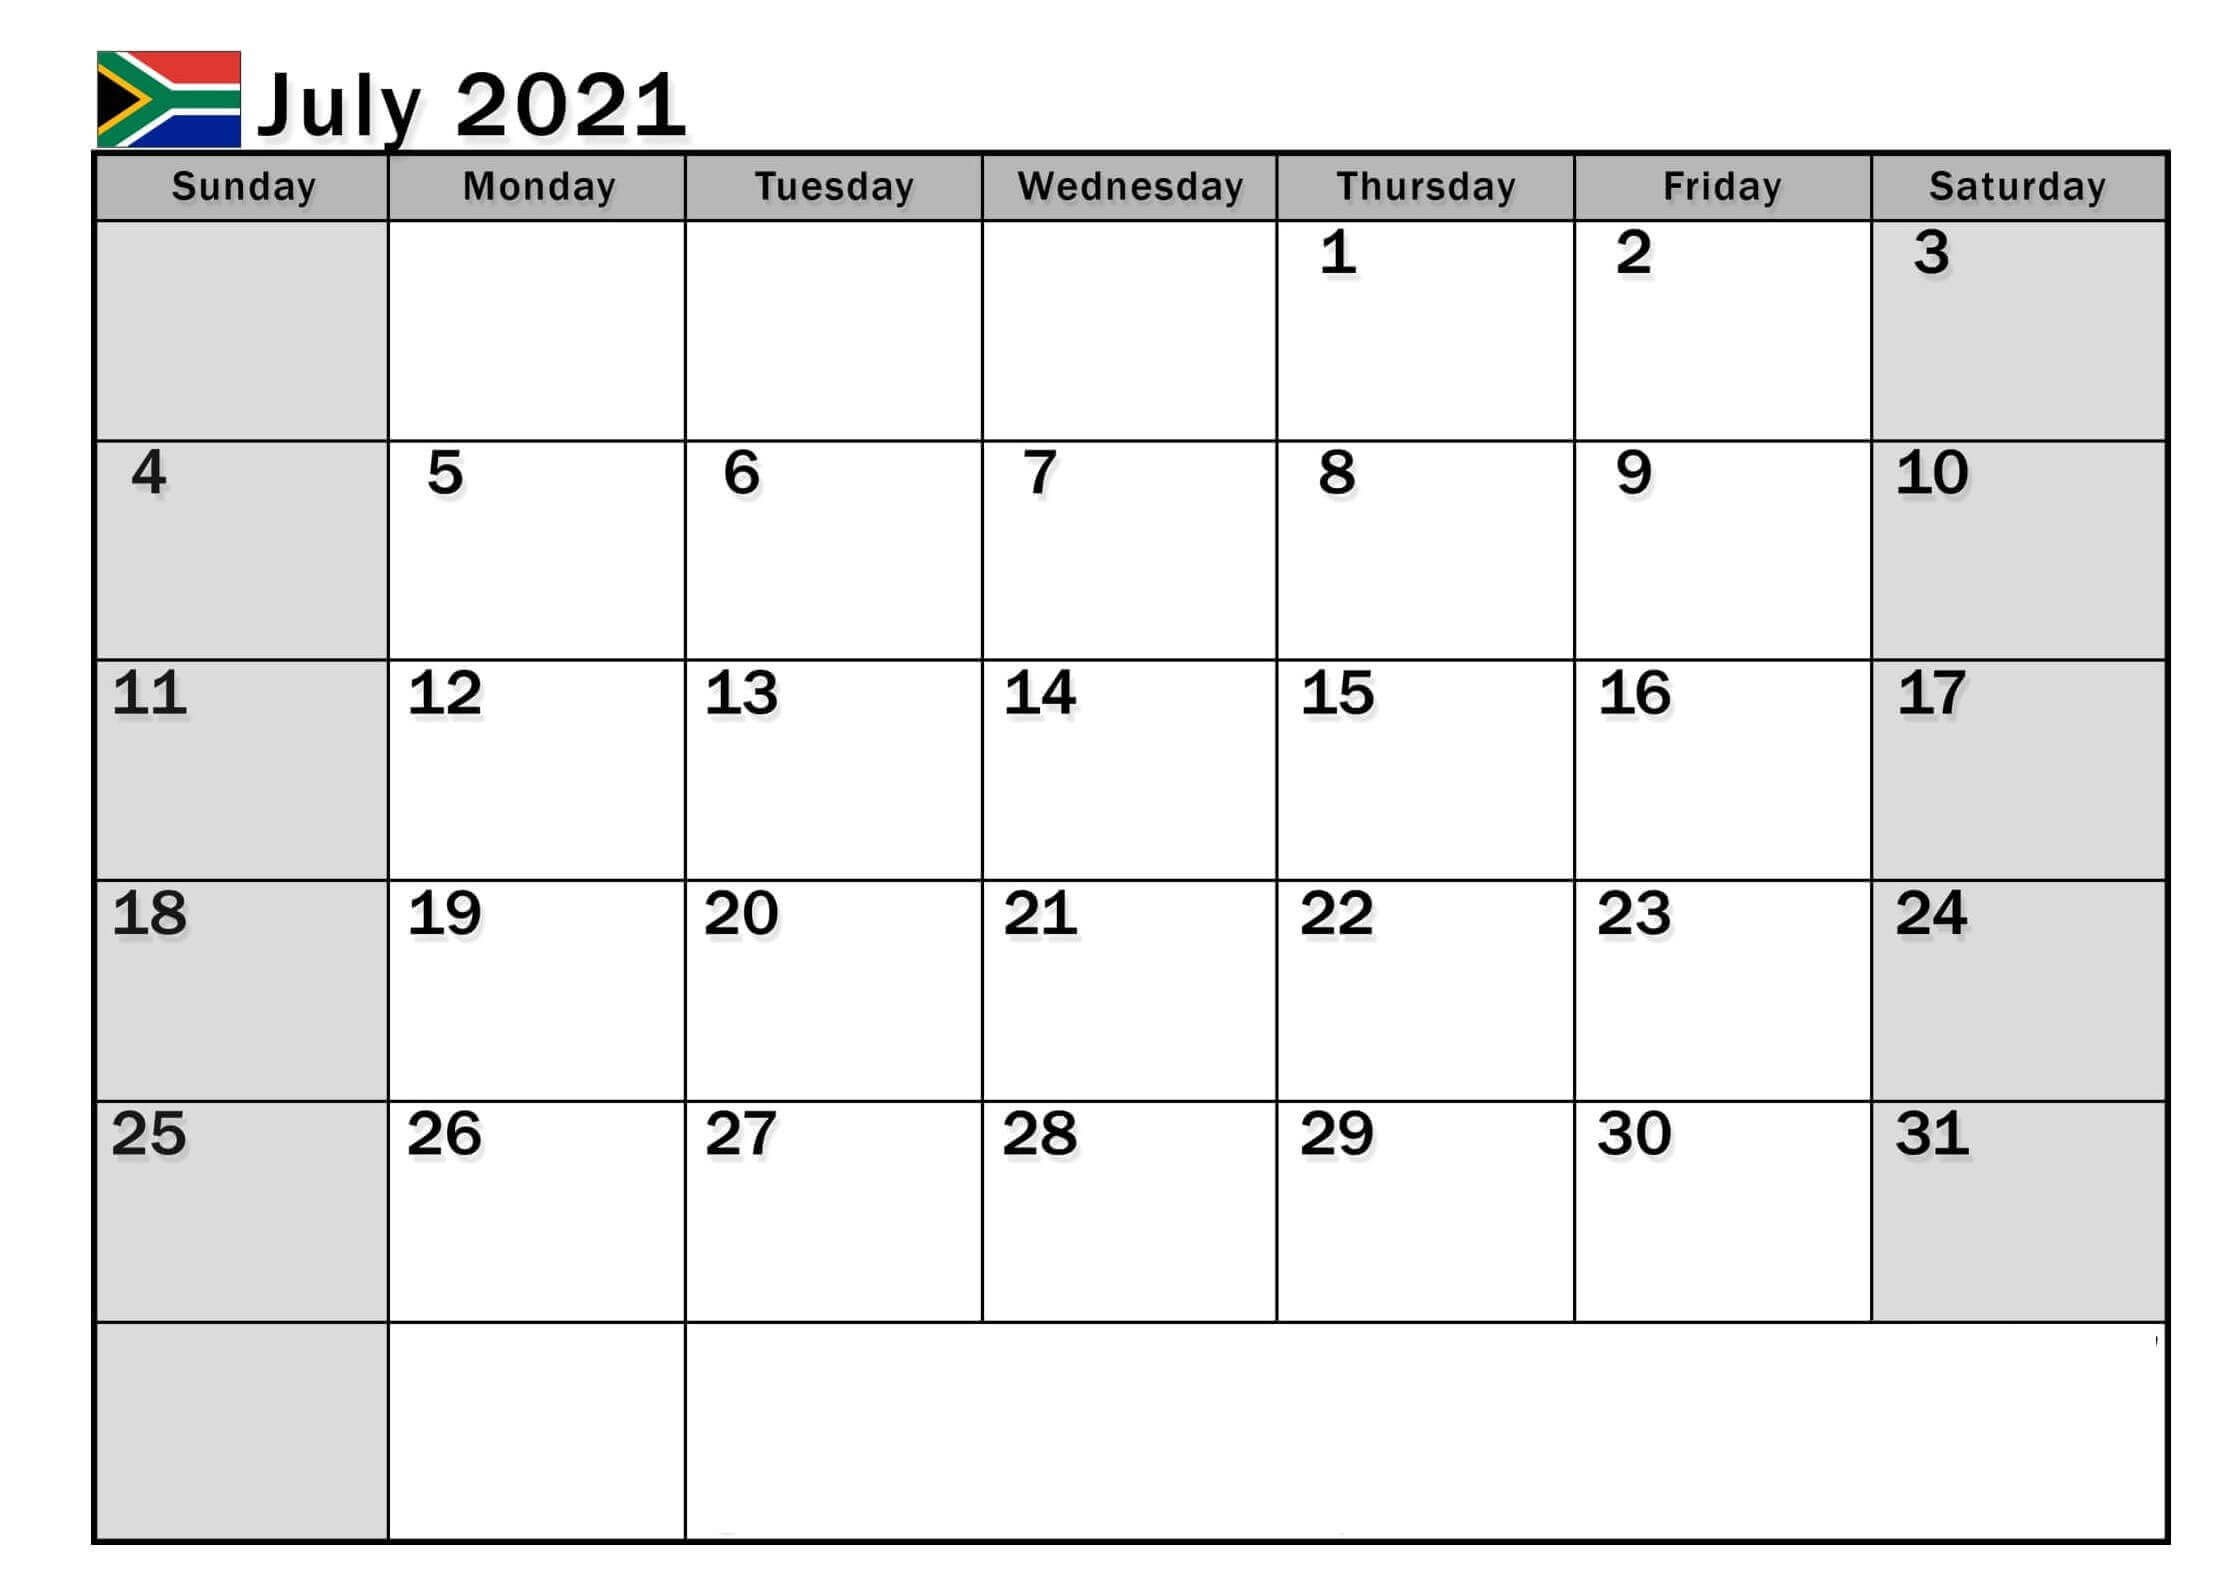 July 2021 South Africa Holidays Calendar